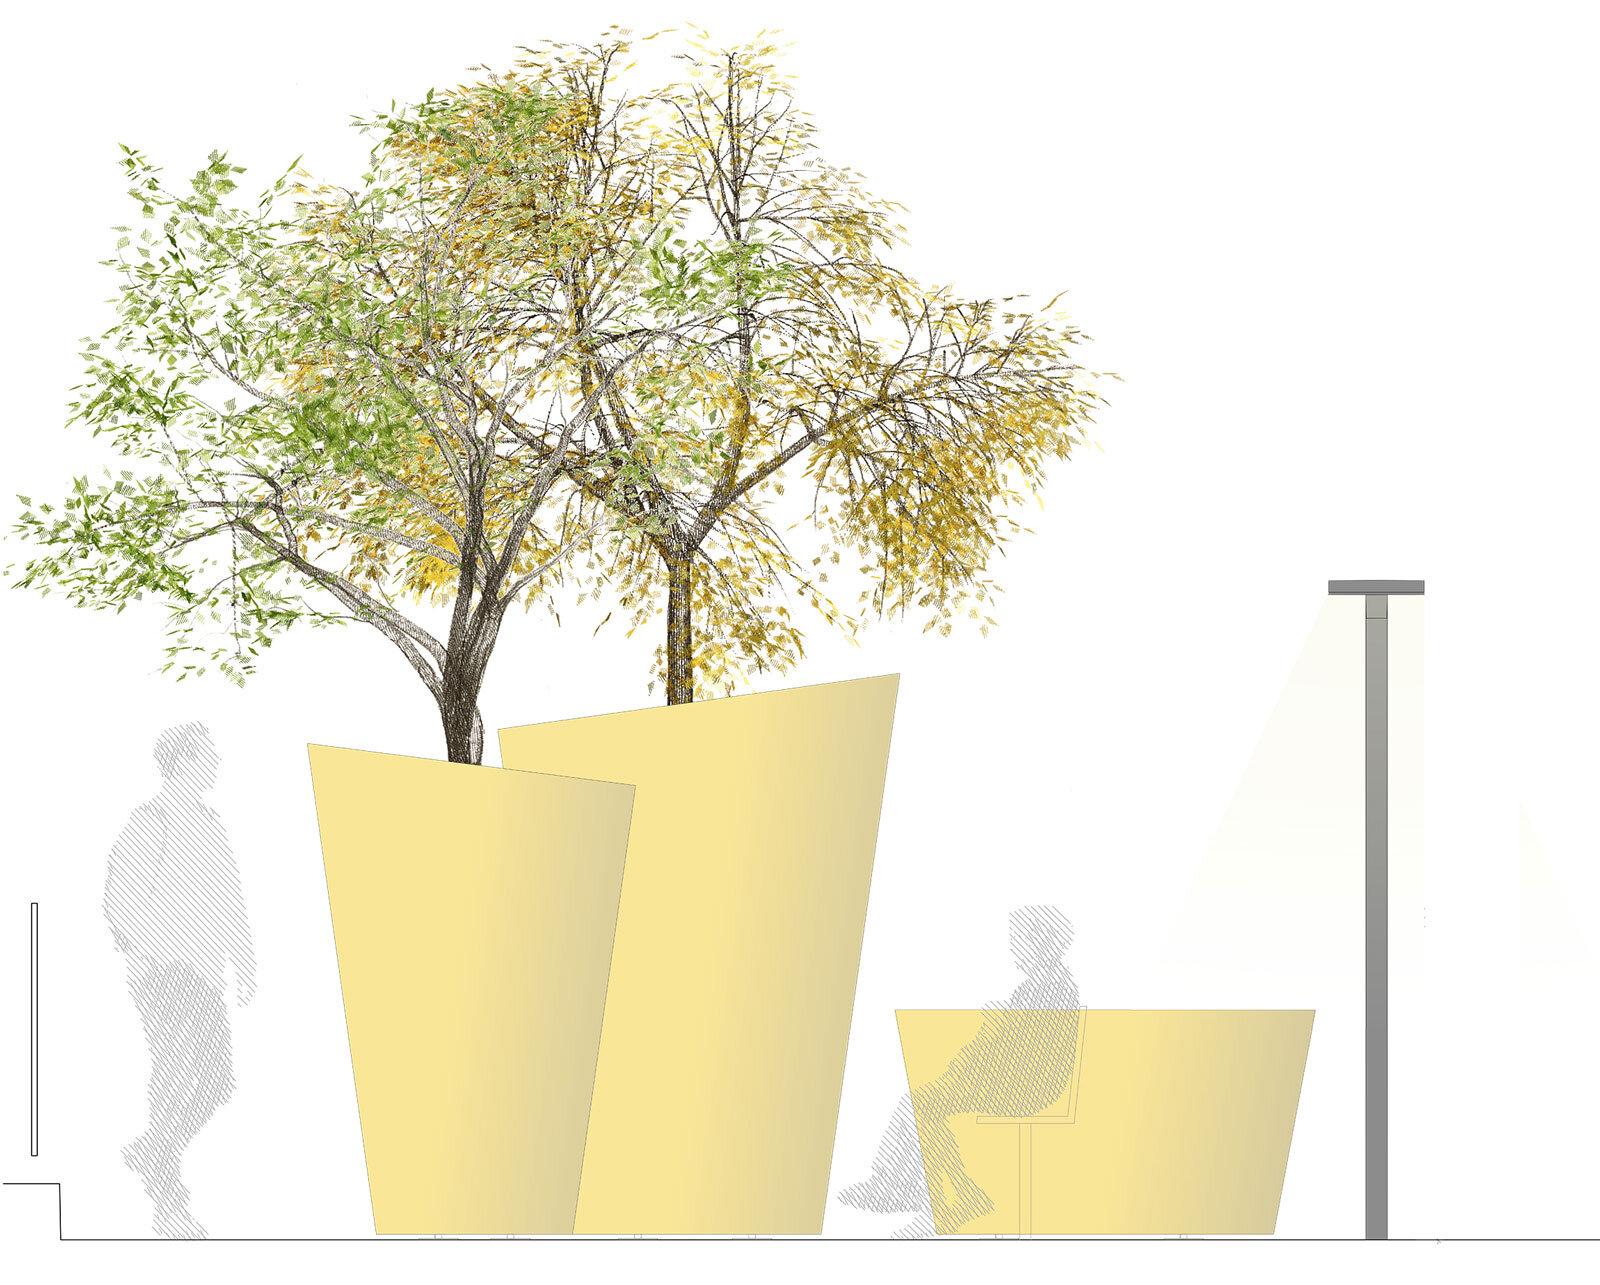 dvarchitectes-urbanisme-condemines-pots_3.jpg